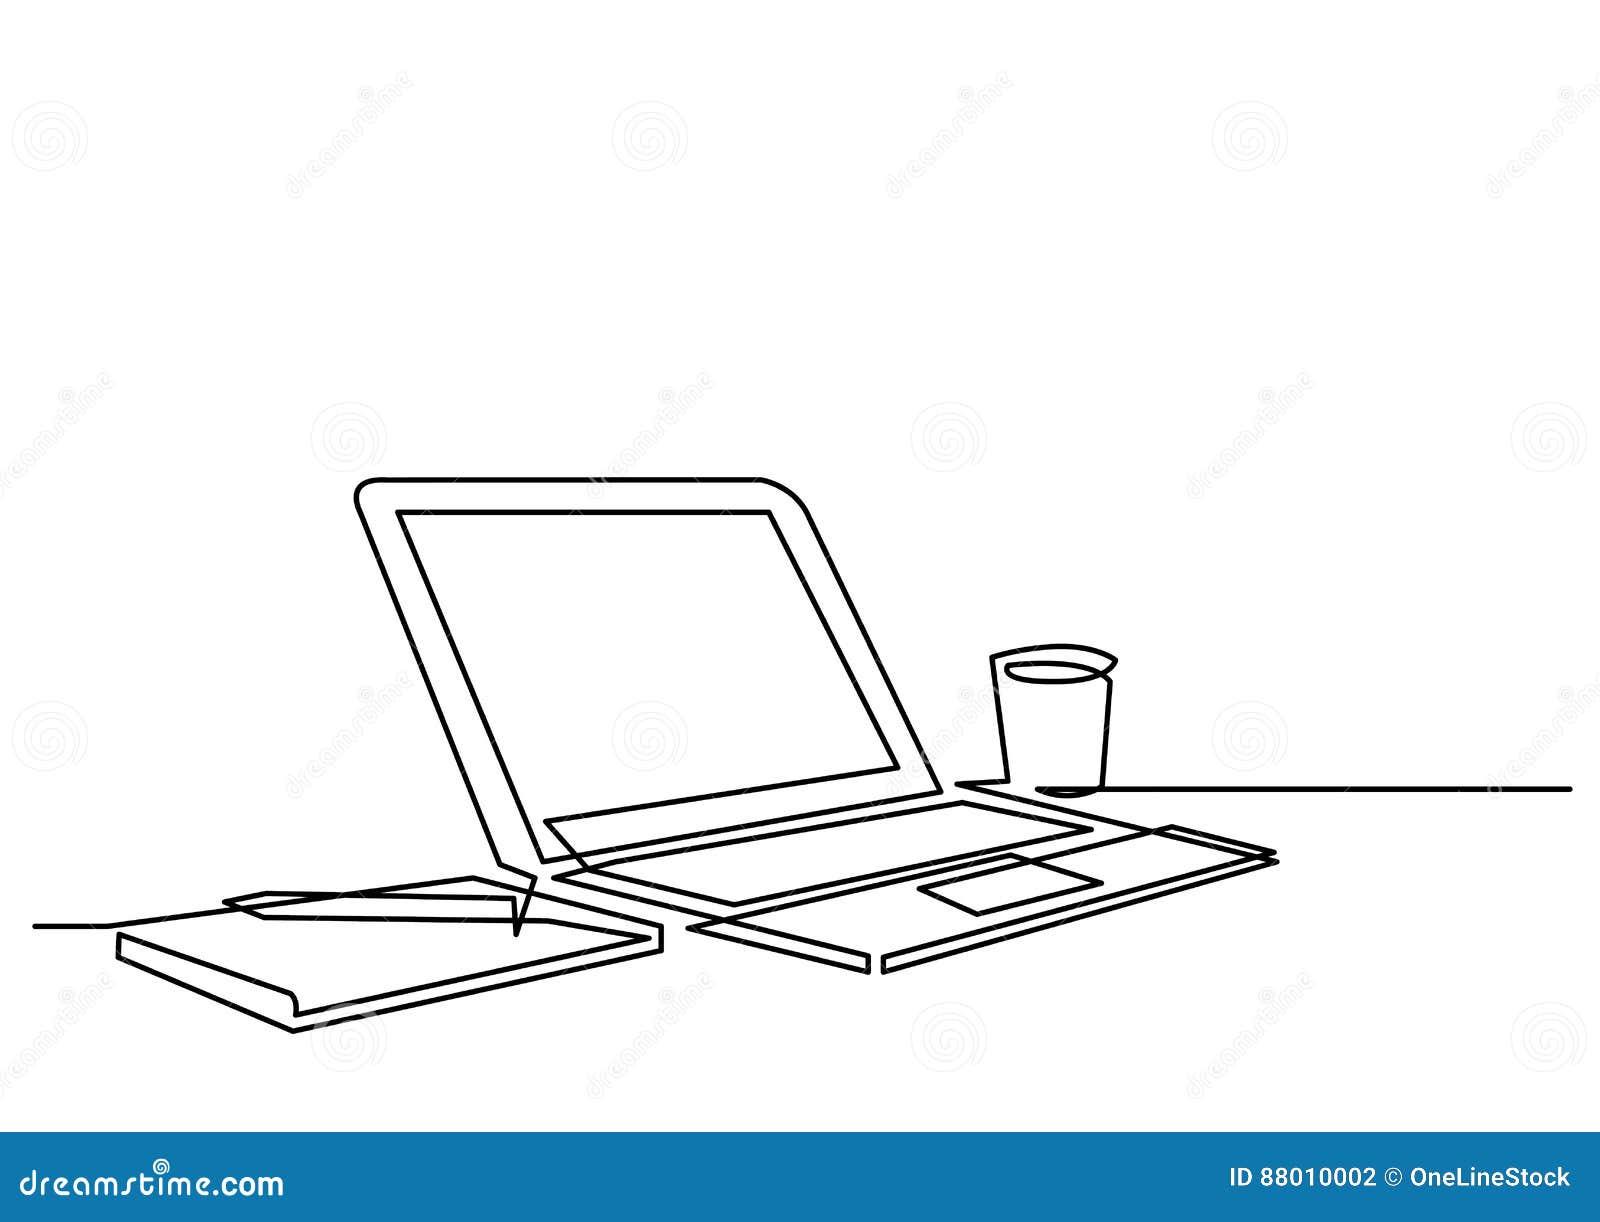 Dessin Au Trait Continu De Stylo D Ordinateur Portable De Bureau